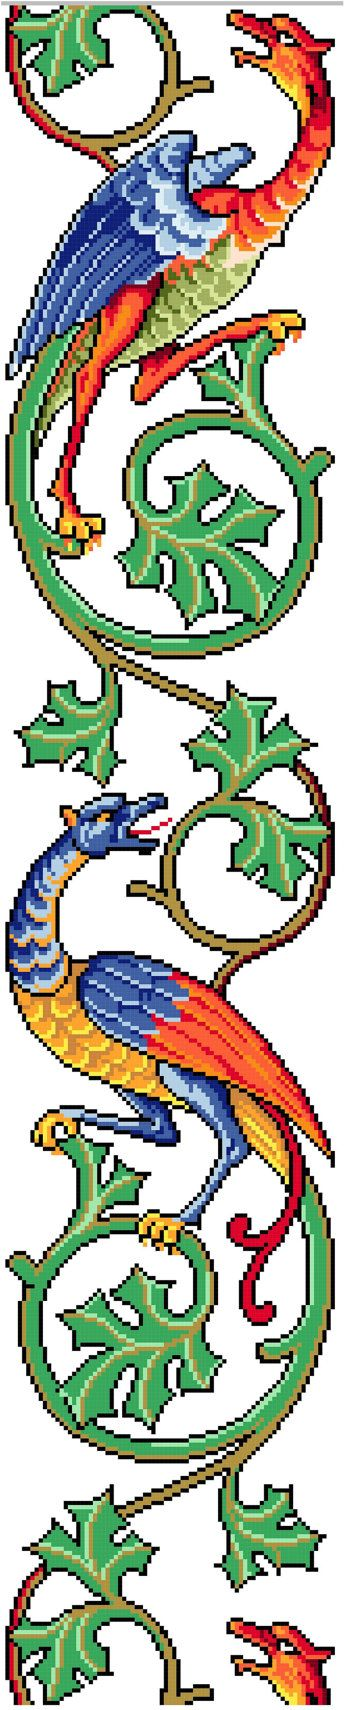 Celtic Cross Stitch | Celtic dragons - Cross stitch pattern . Instant download